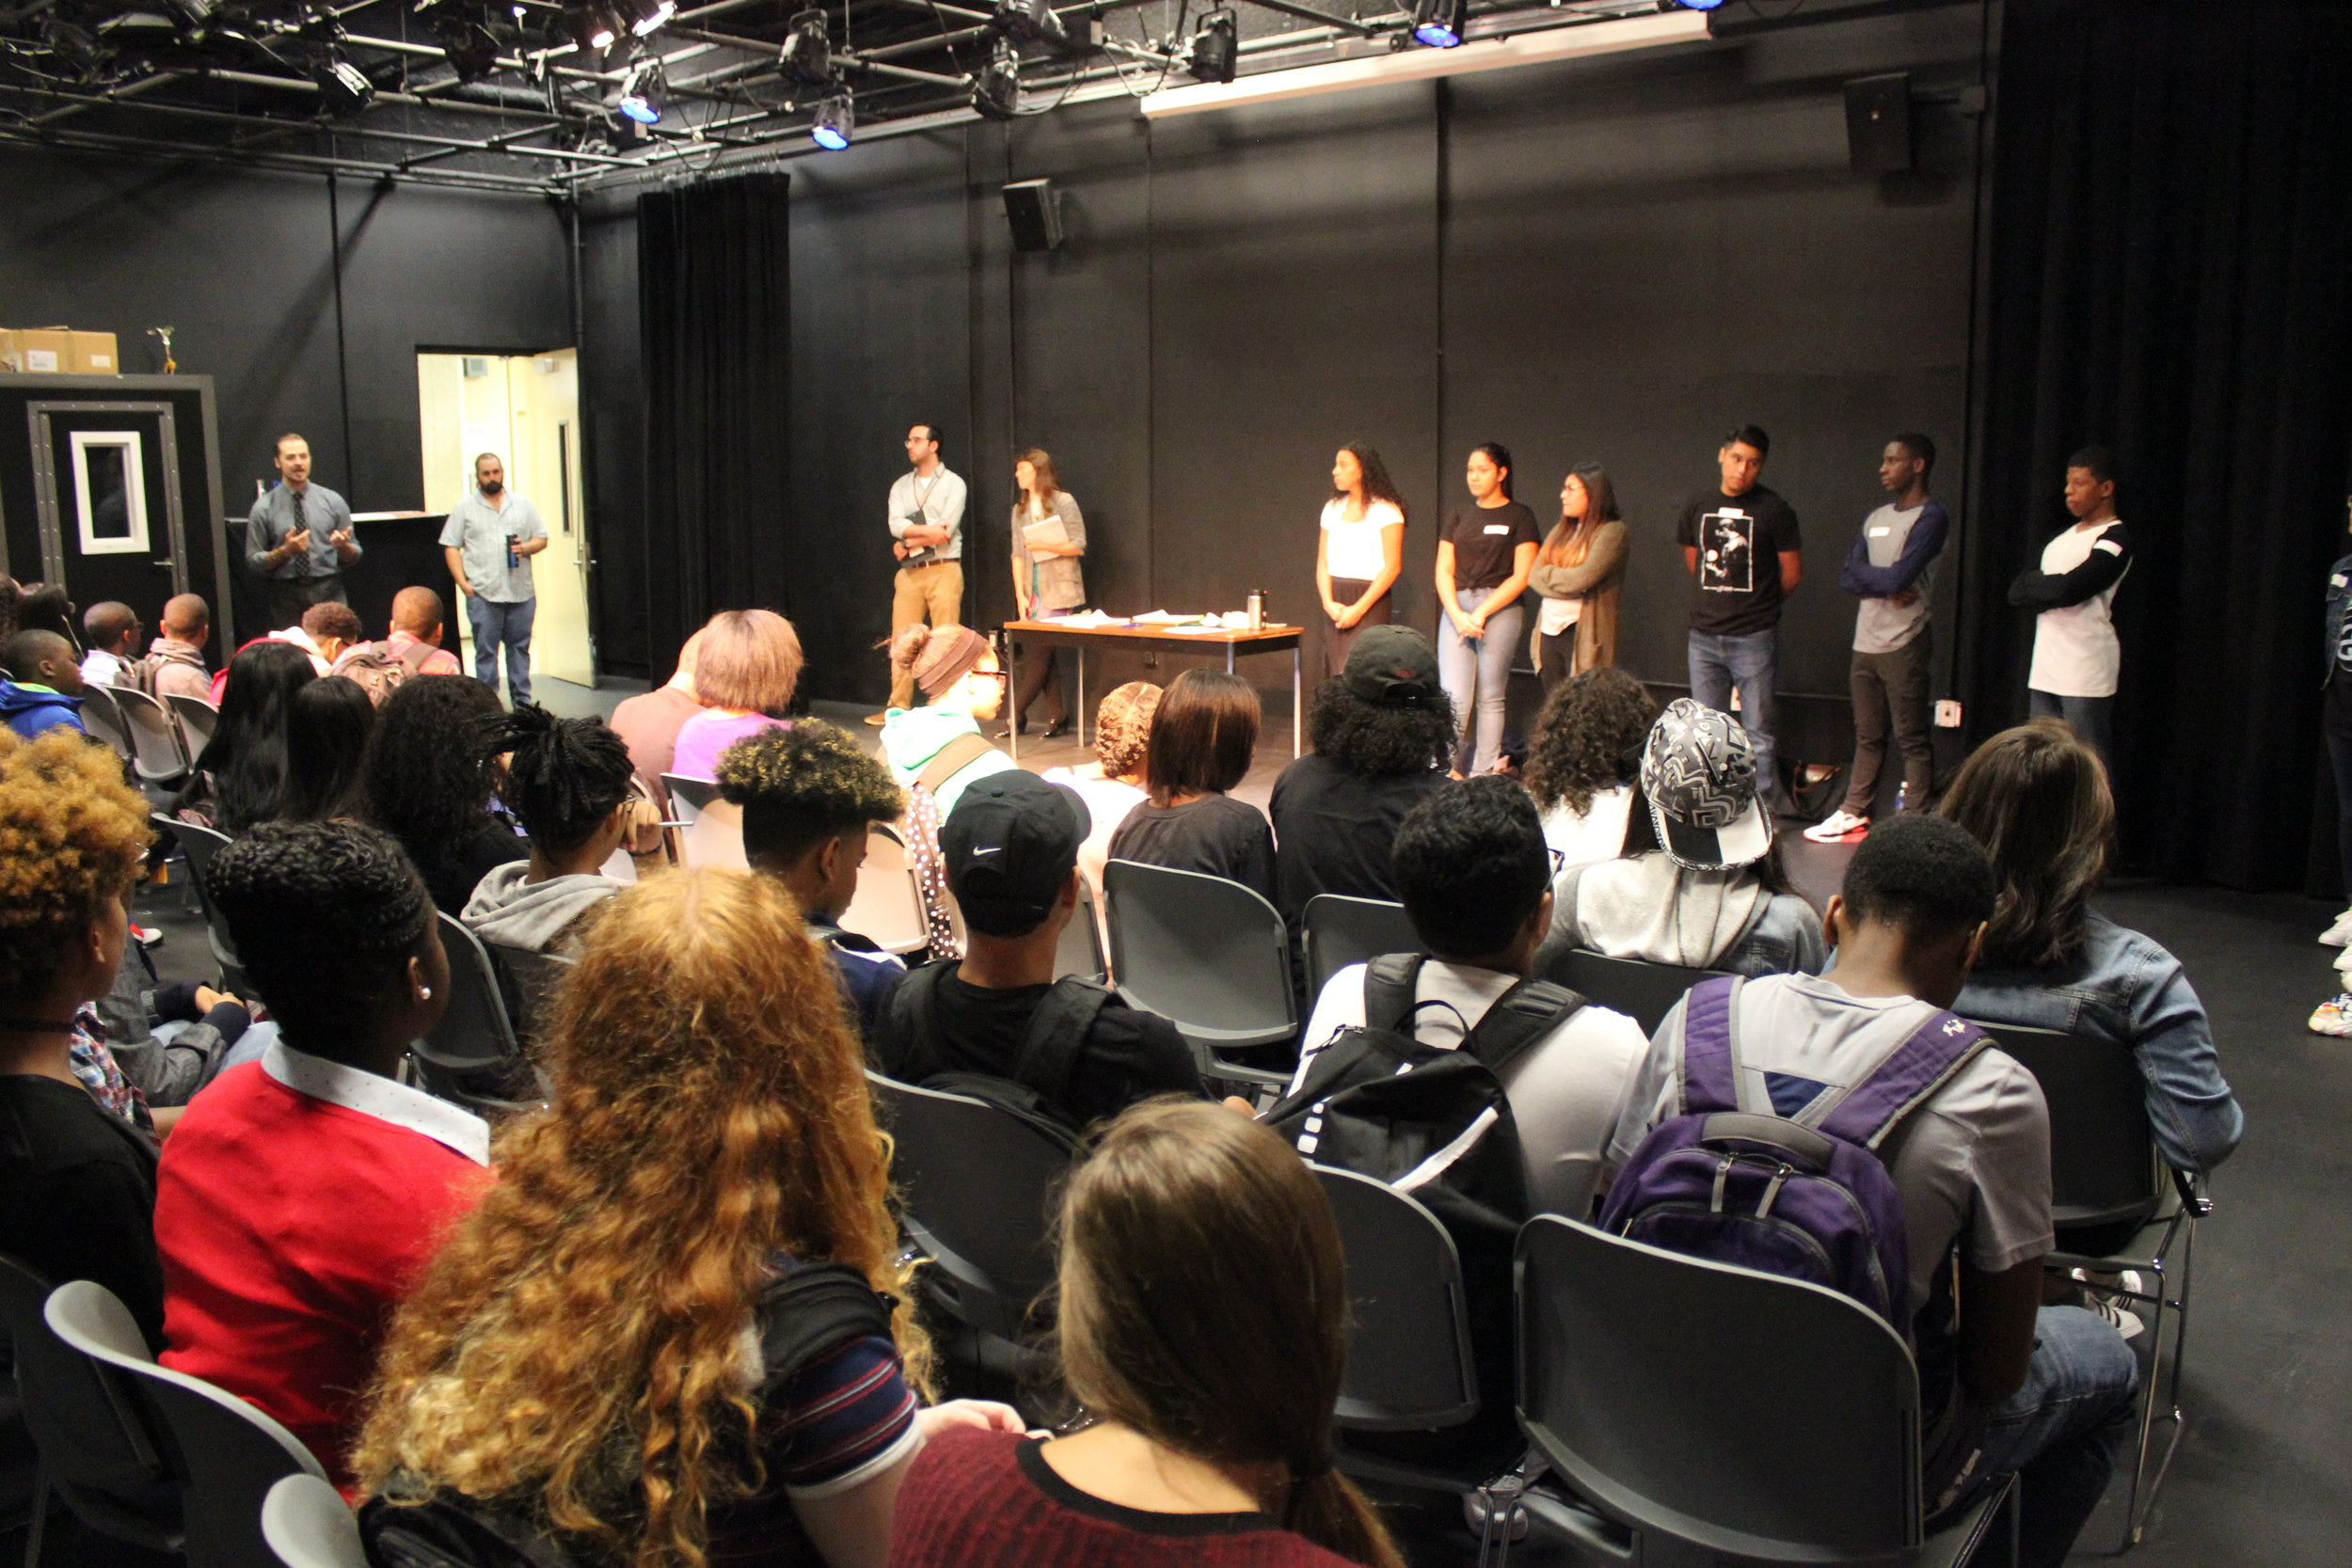 Student ambassadors introduce themselves